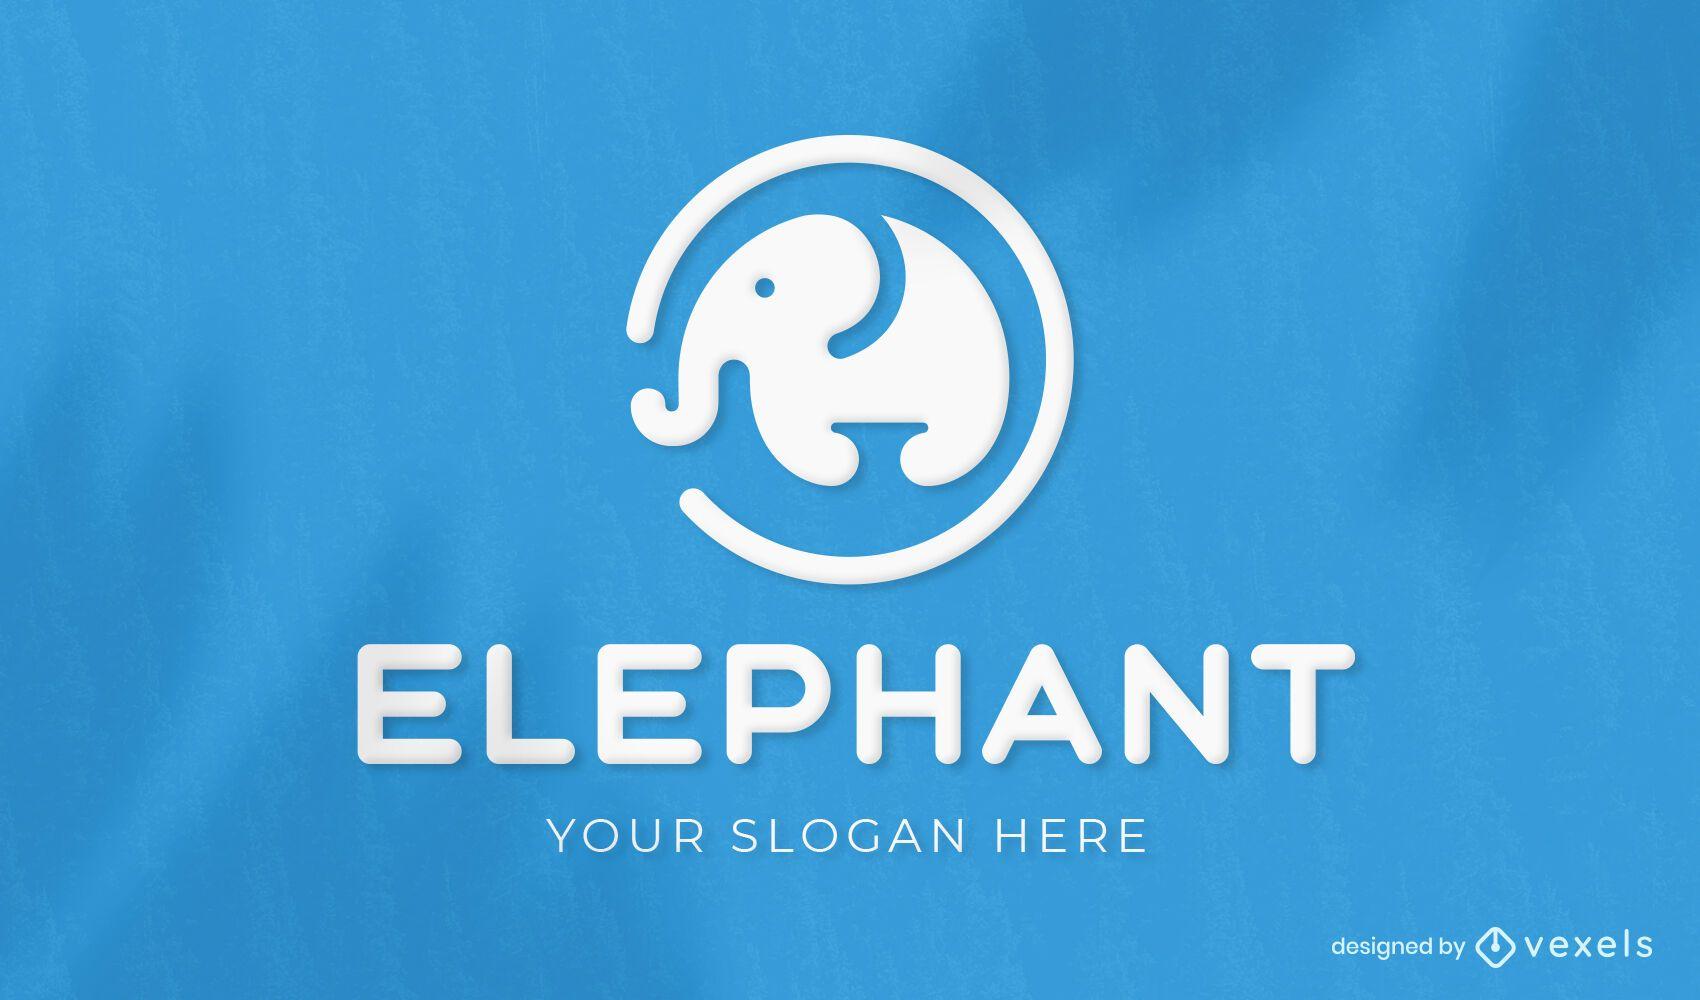 Elefantentier Logo-Design ausgeschnitten